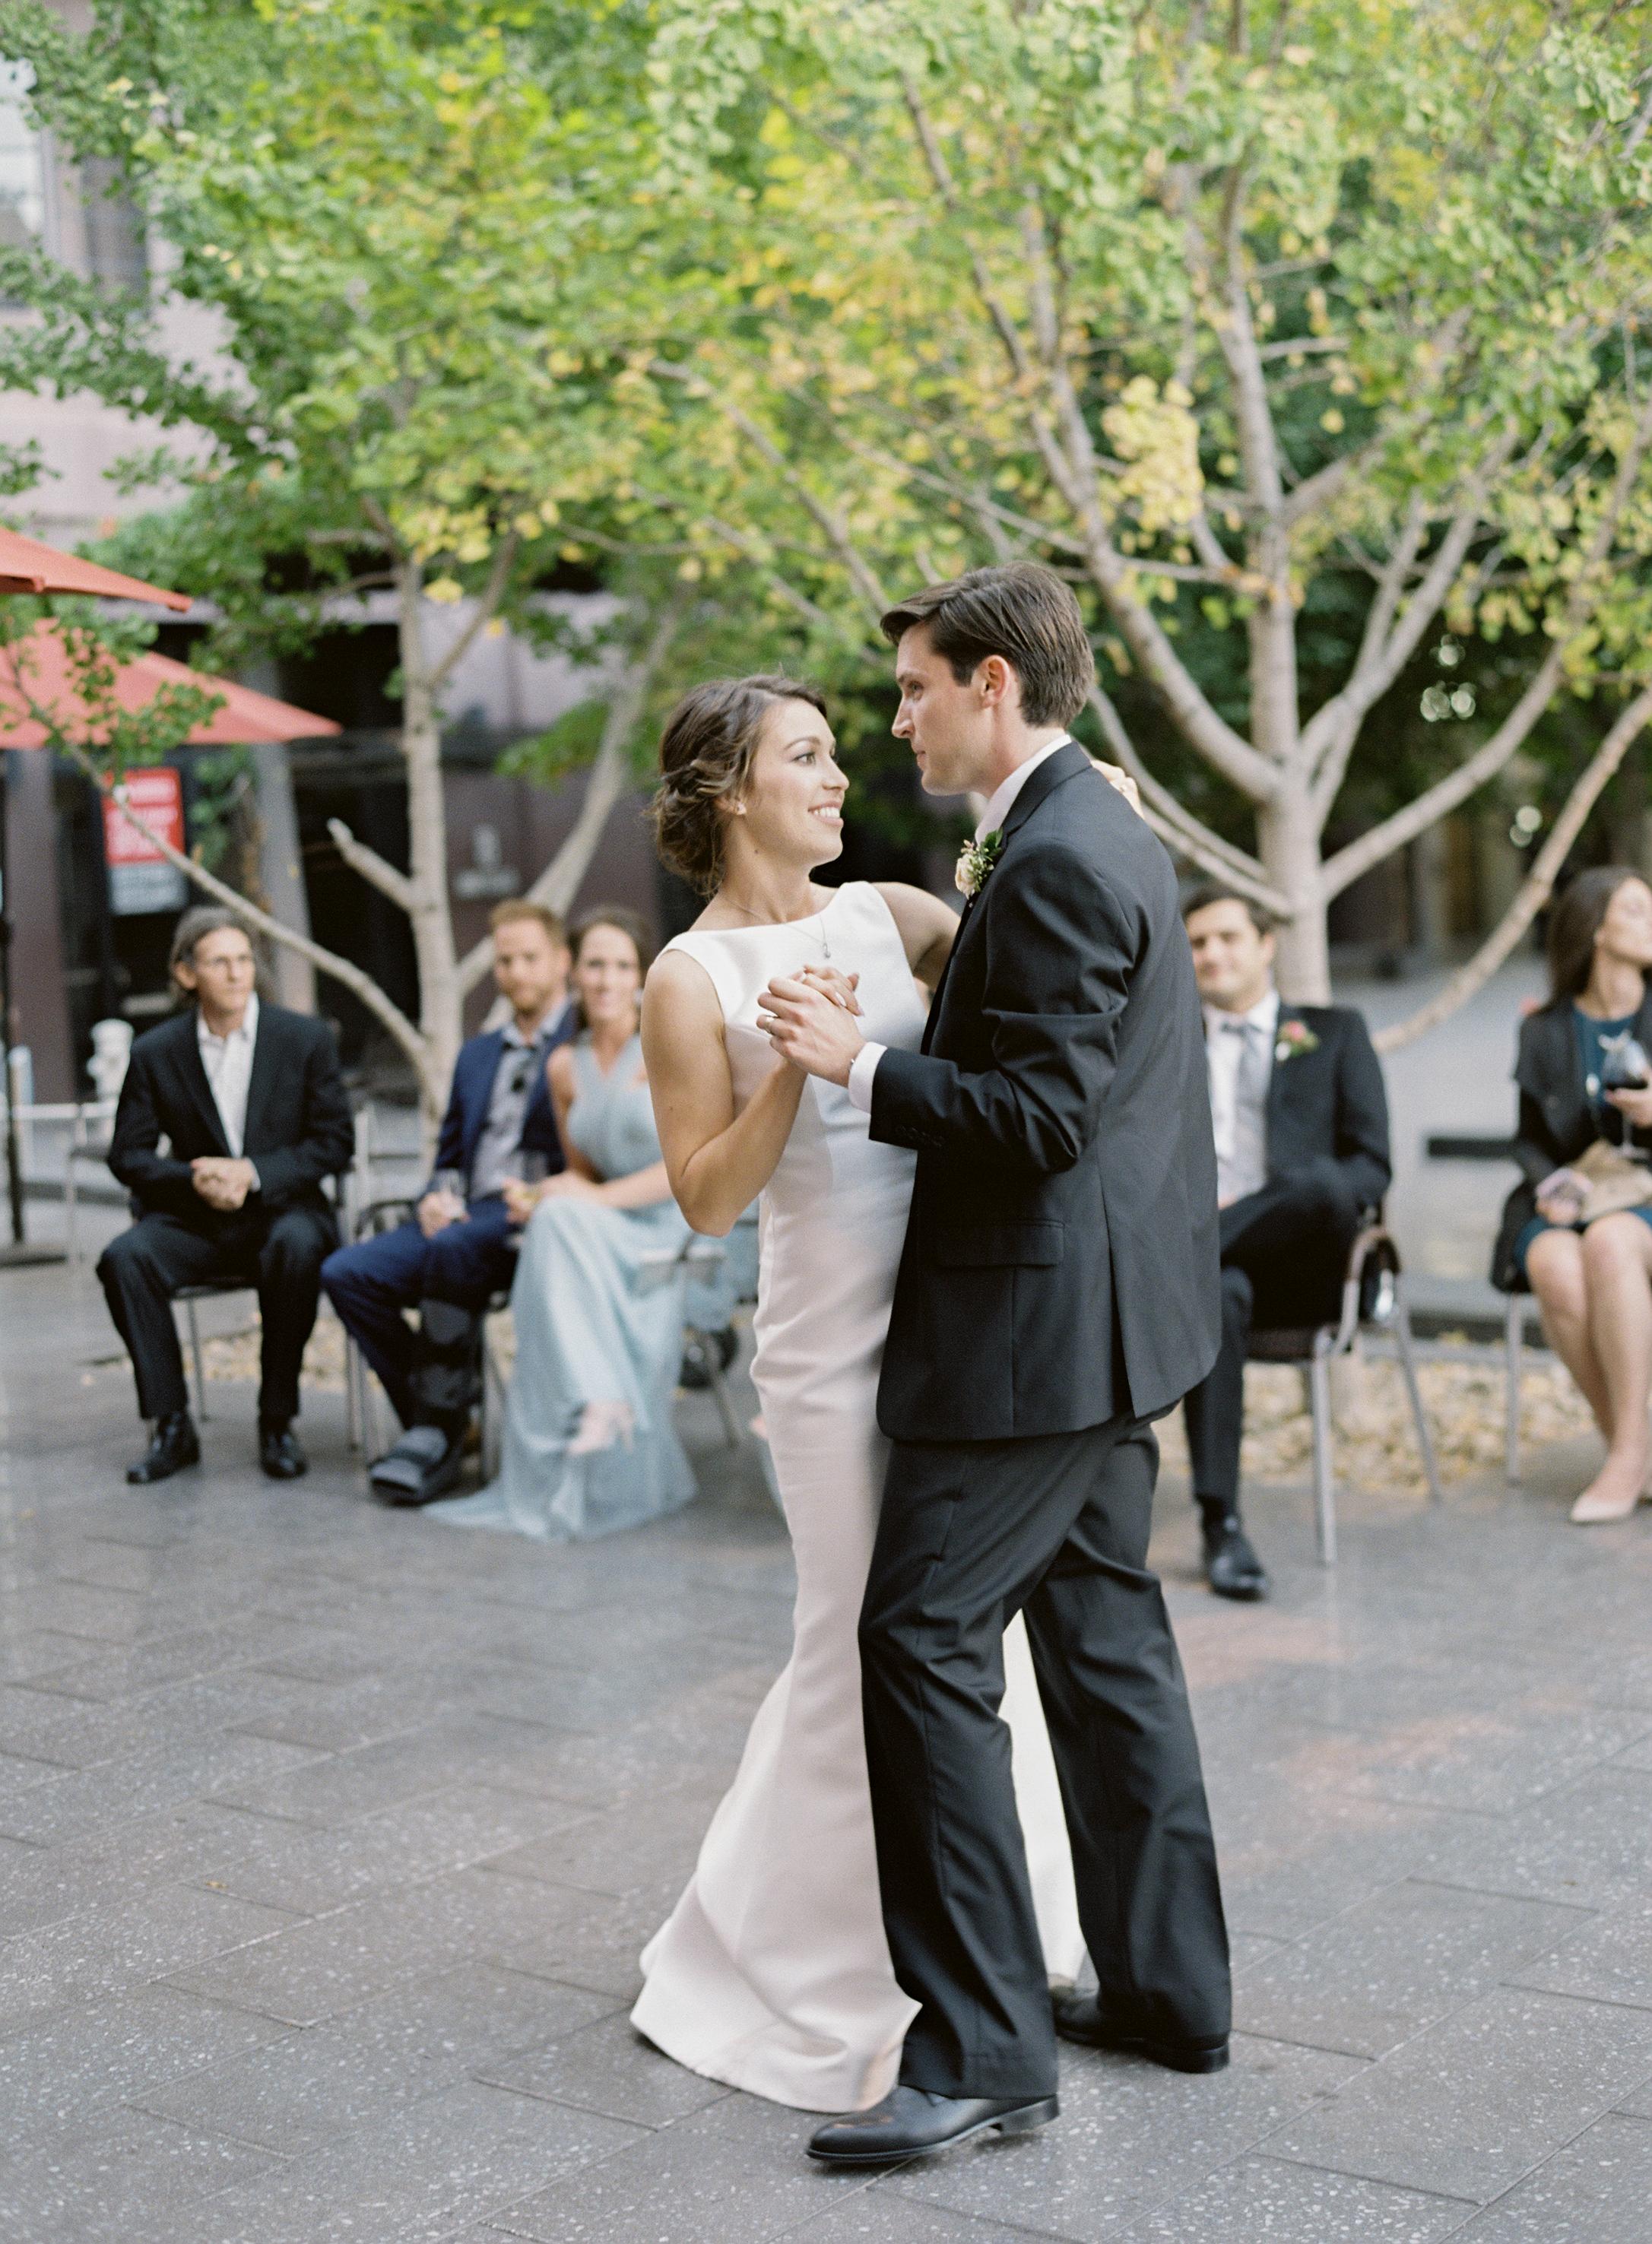 Meghan Mehan Photography - California Wedding Photographer | San Francisco City Hall Wedding 110.jpg